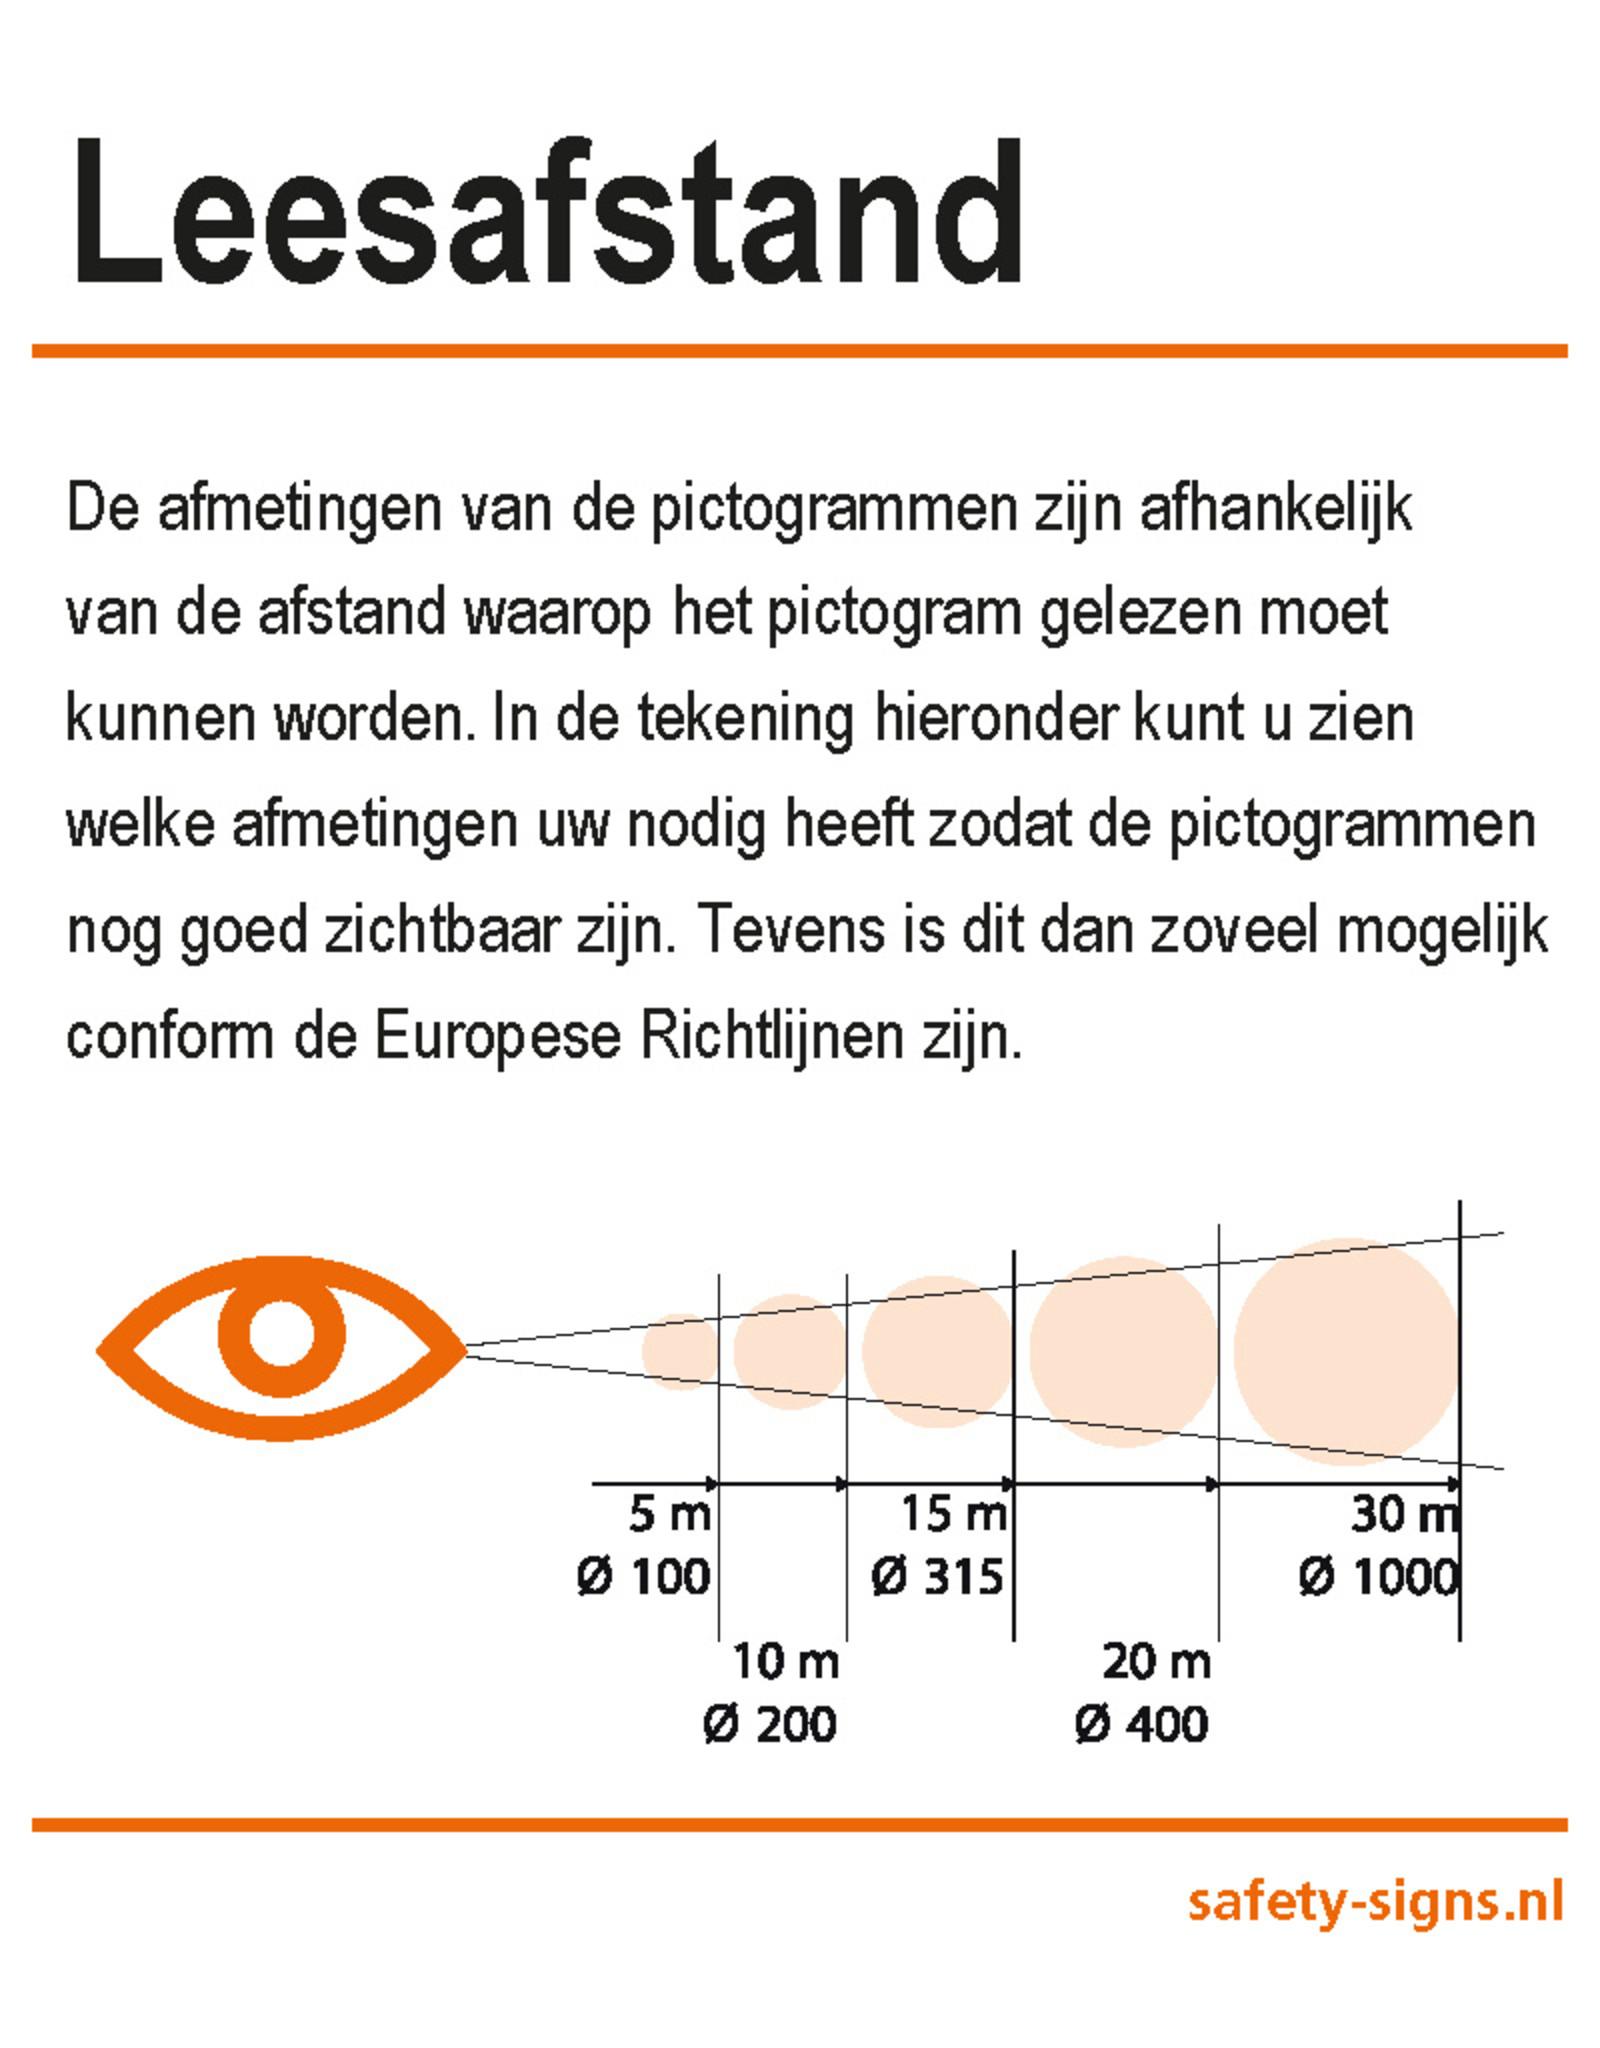 safety-signs.nl Pictogram - W002 - Waarschuwing explosieve stoffen - ISO 7010